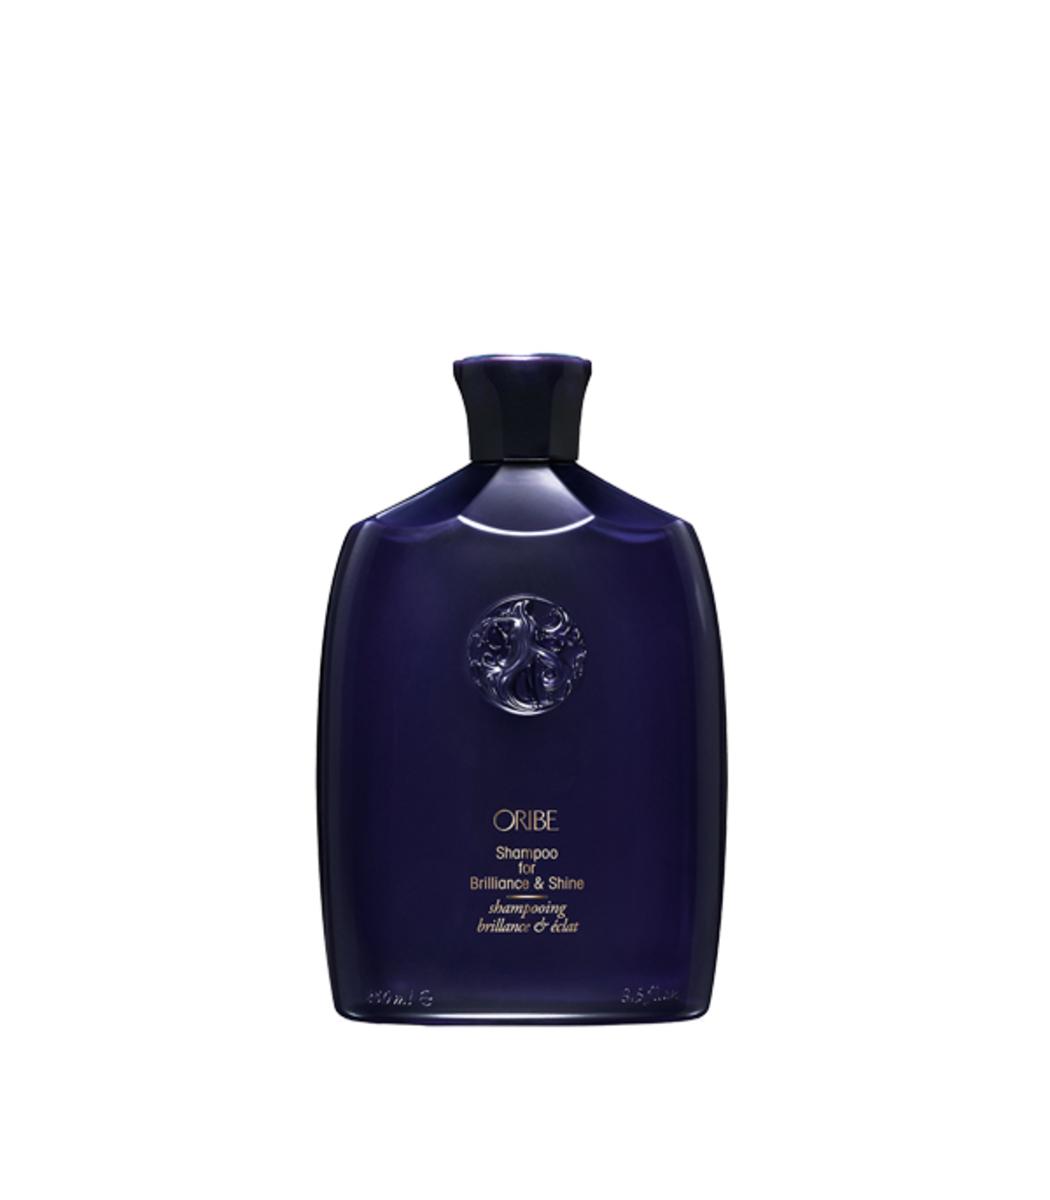 Shampoo Brilliance & Shine